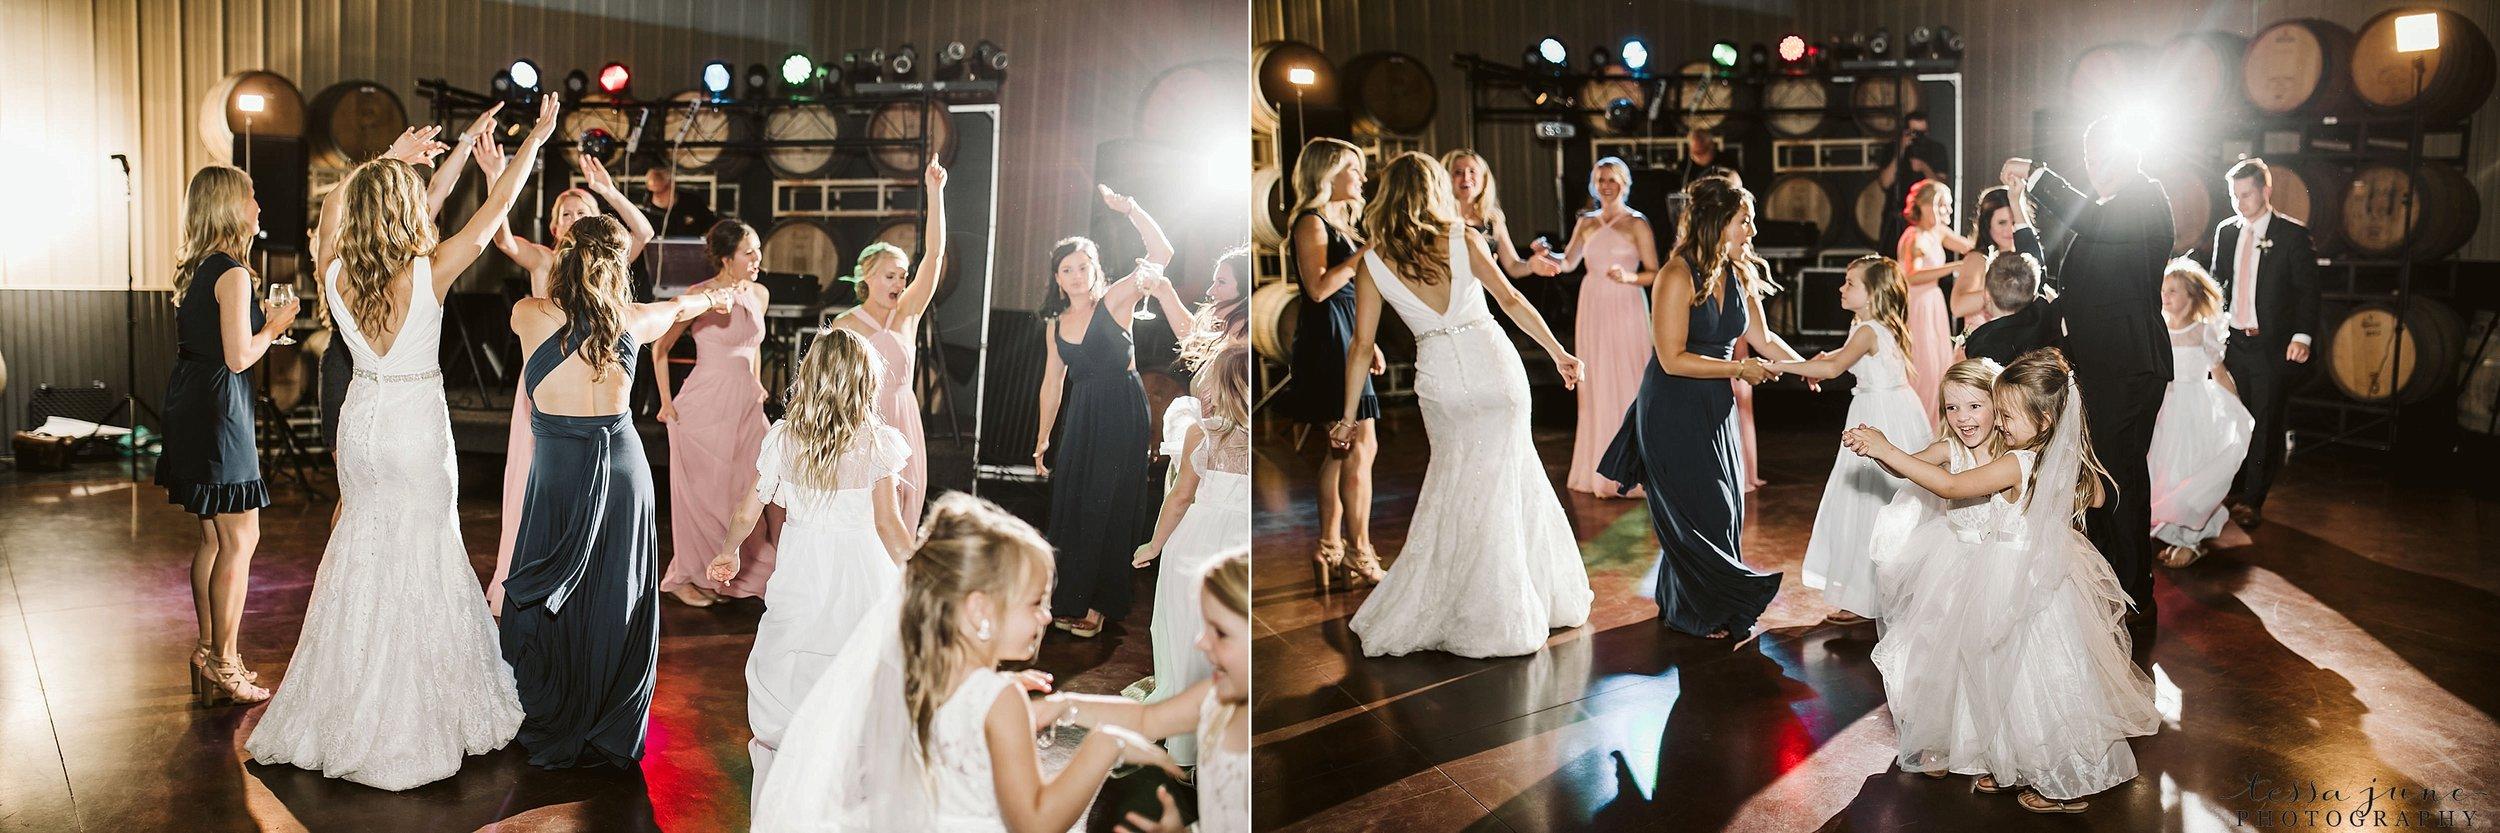 carlos-creek-winery-wedding-summer-pristine-floral-blush-pink-navy-alexandria-minnesota-181.jpg